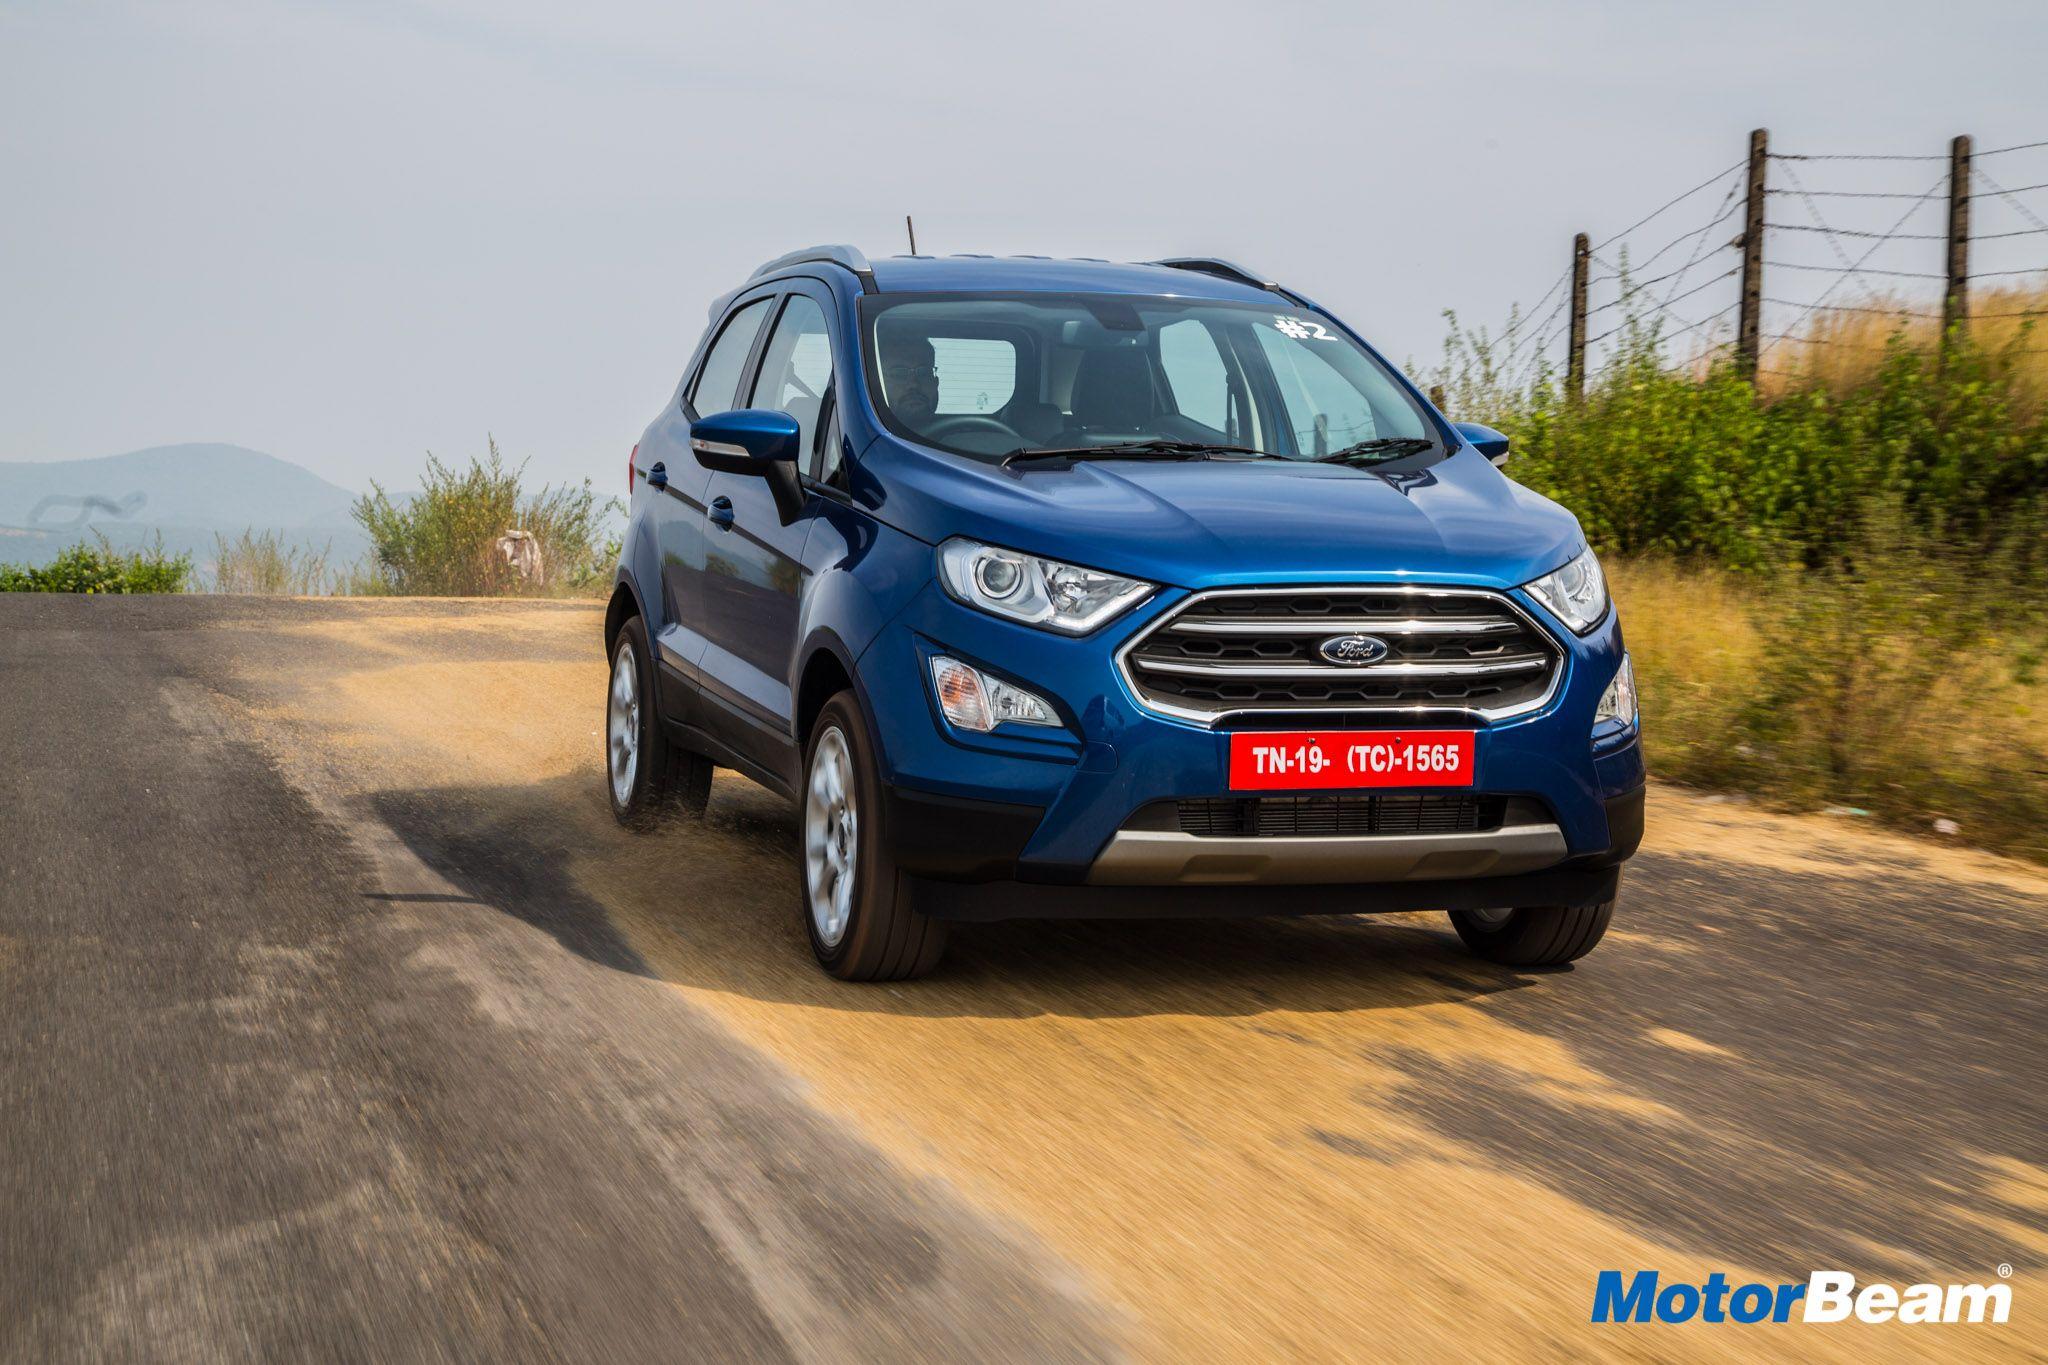 Ford Ecosport Titanium Mt Petrol Variant Price Is Rs 10 47 Lakhs